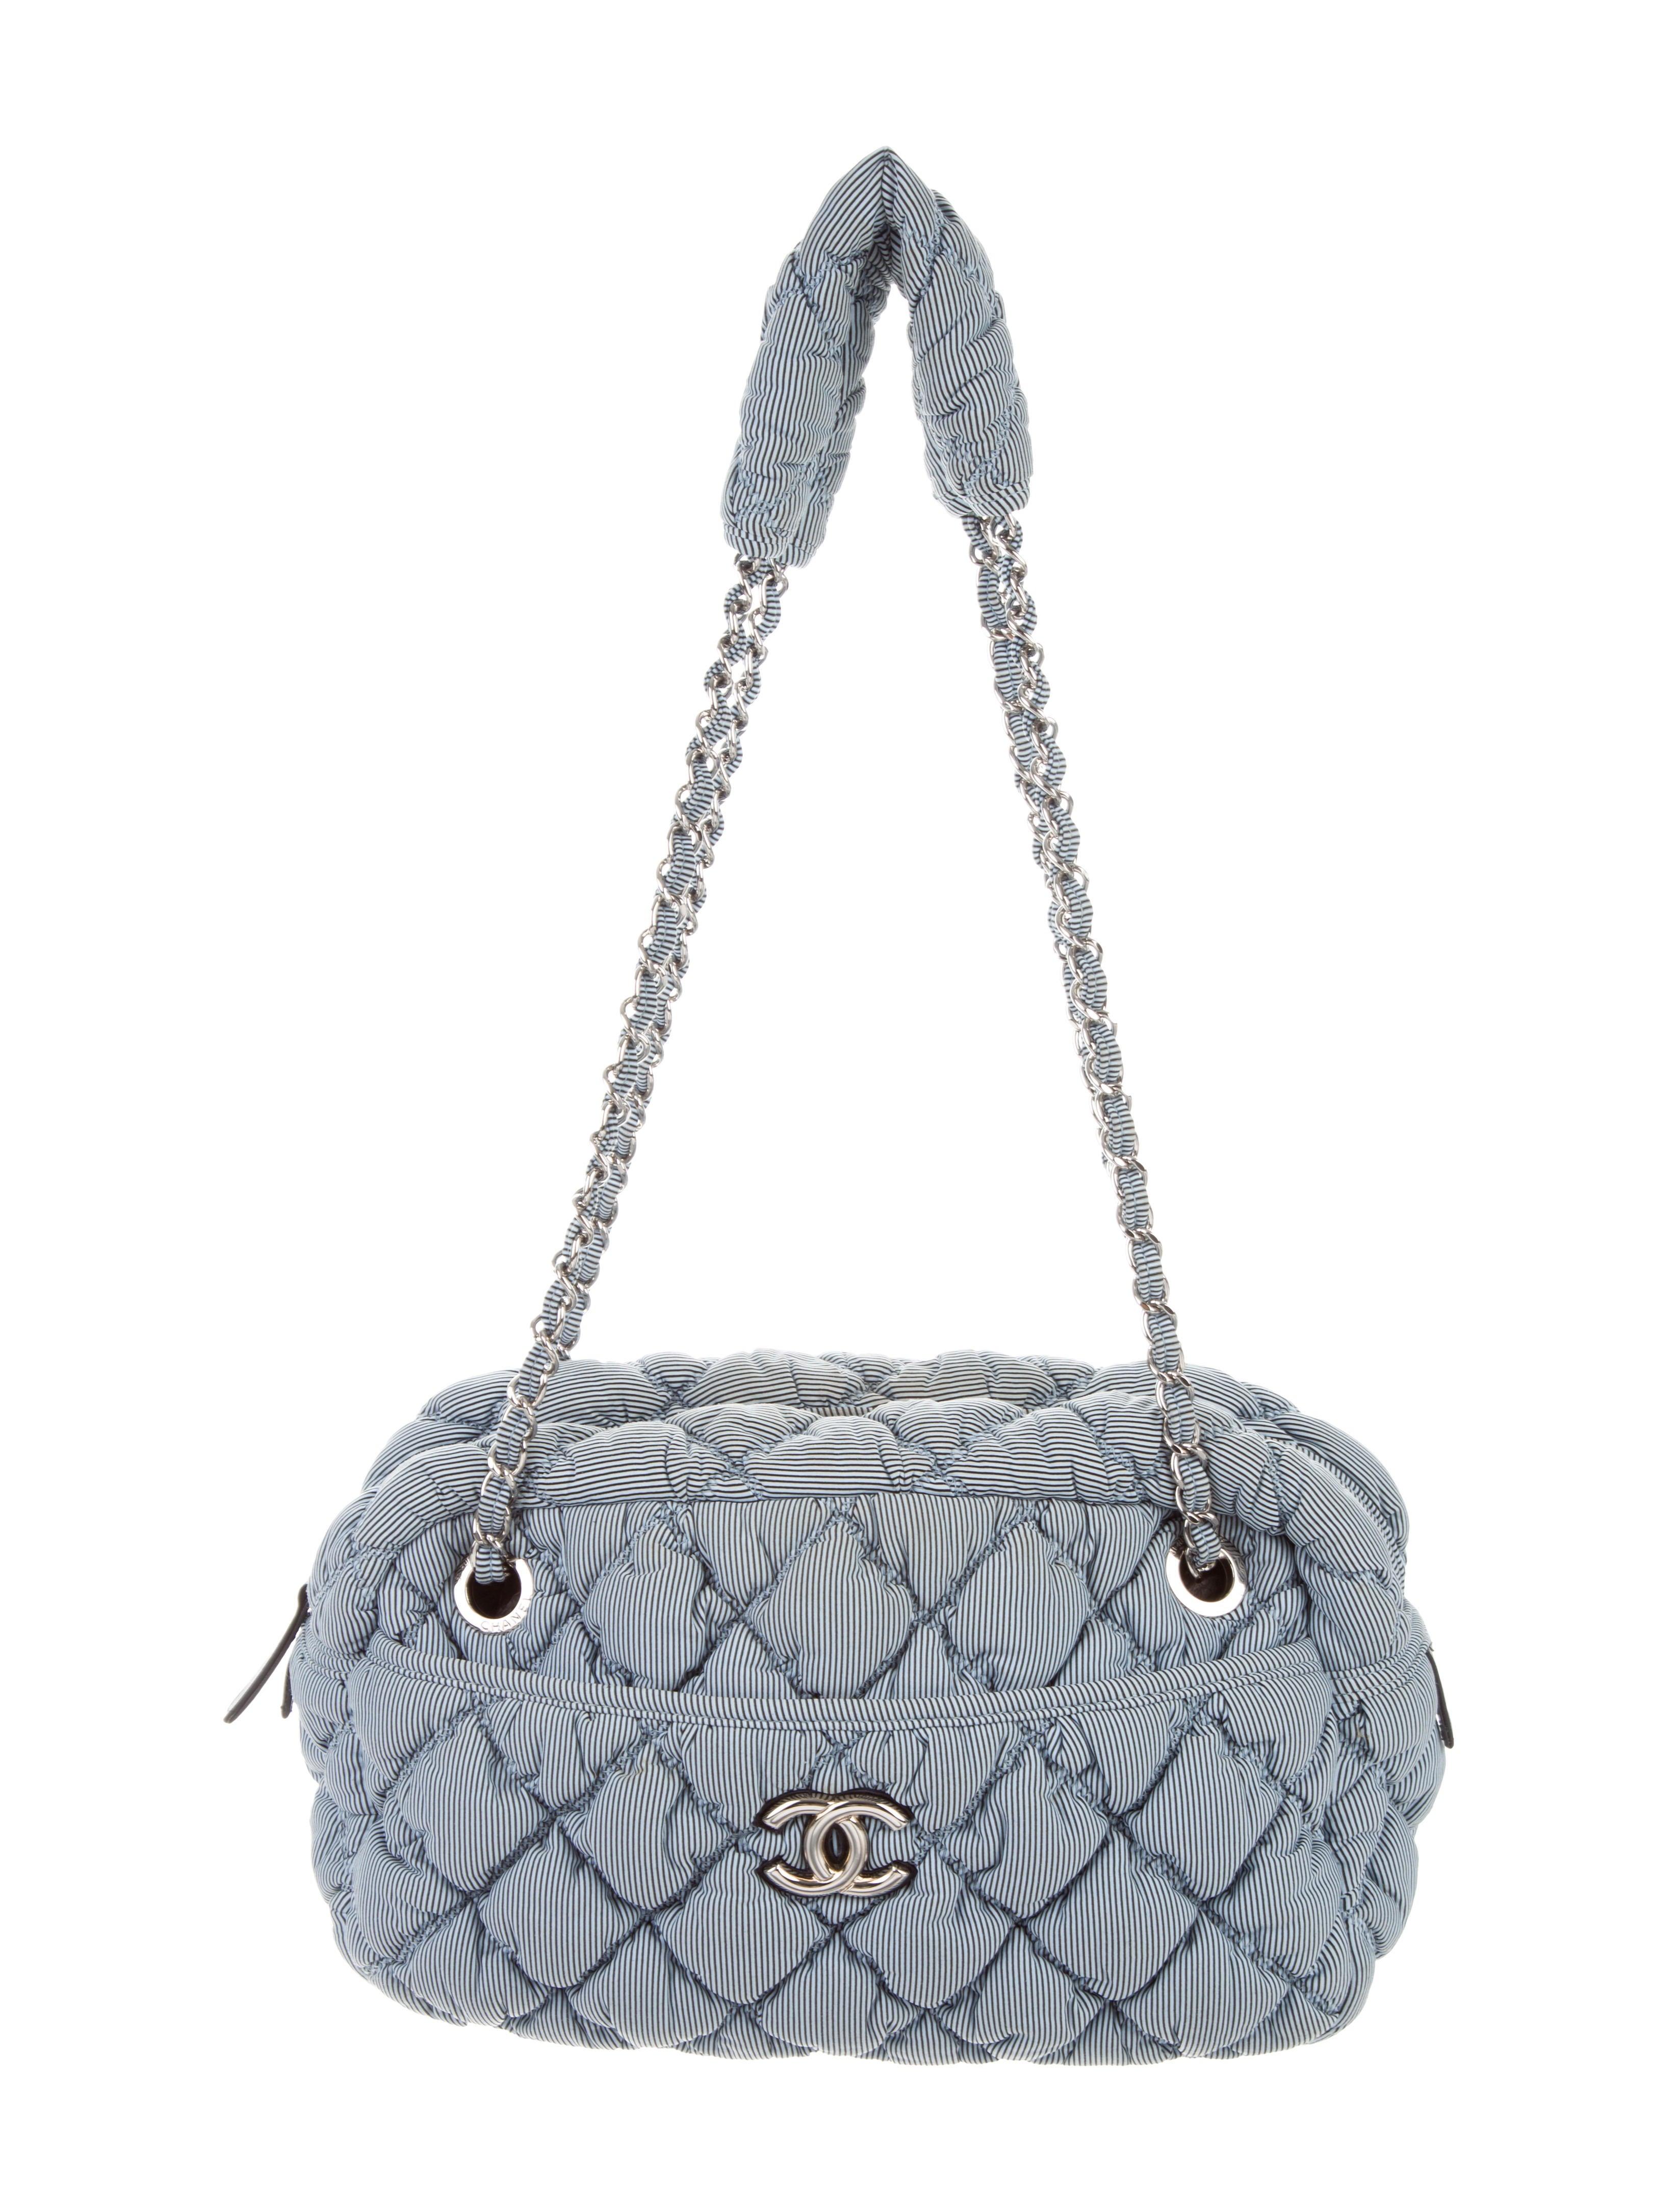 e748ed9ffc3 Chanel Bubble Quilt Camera Bag - Handbags - CHA303938